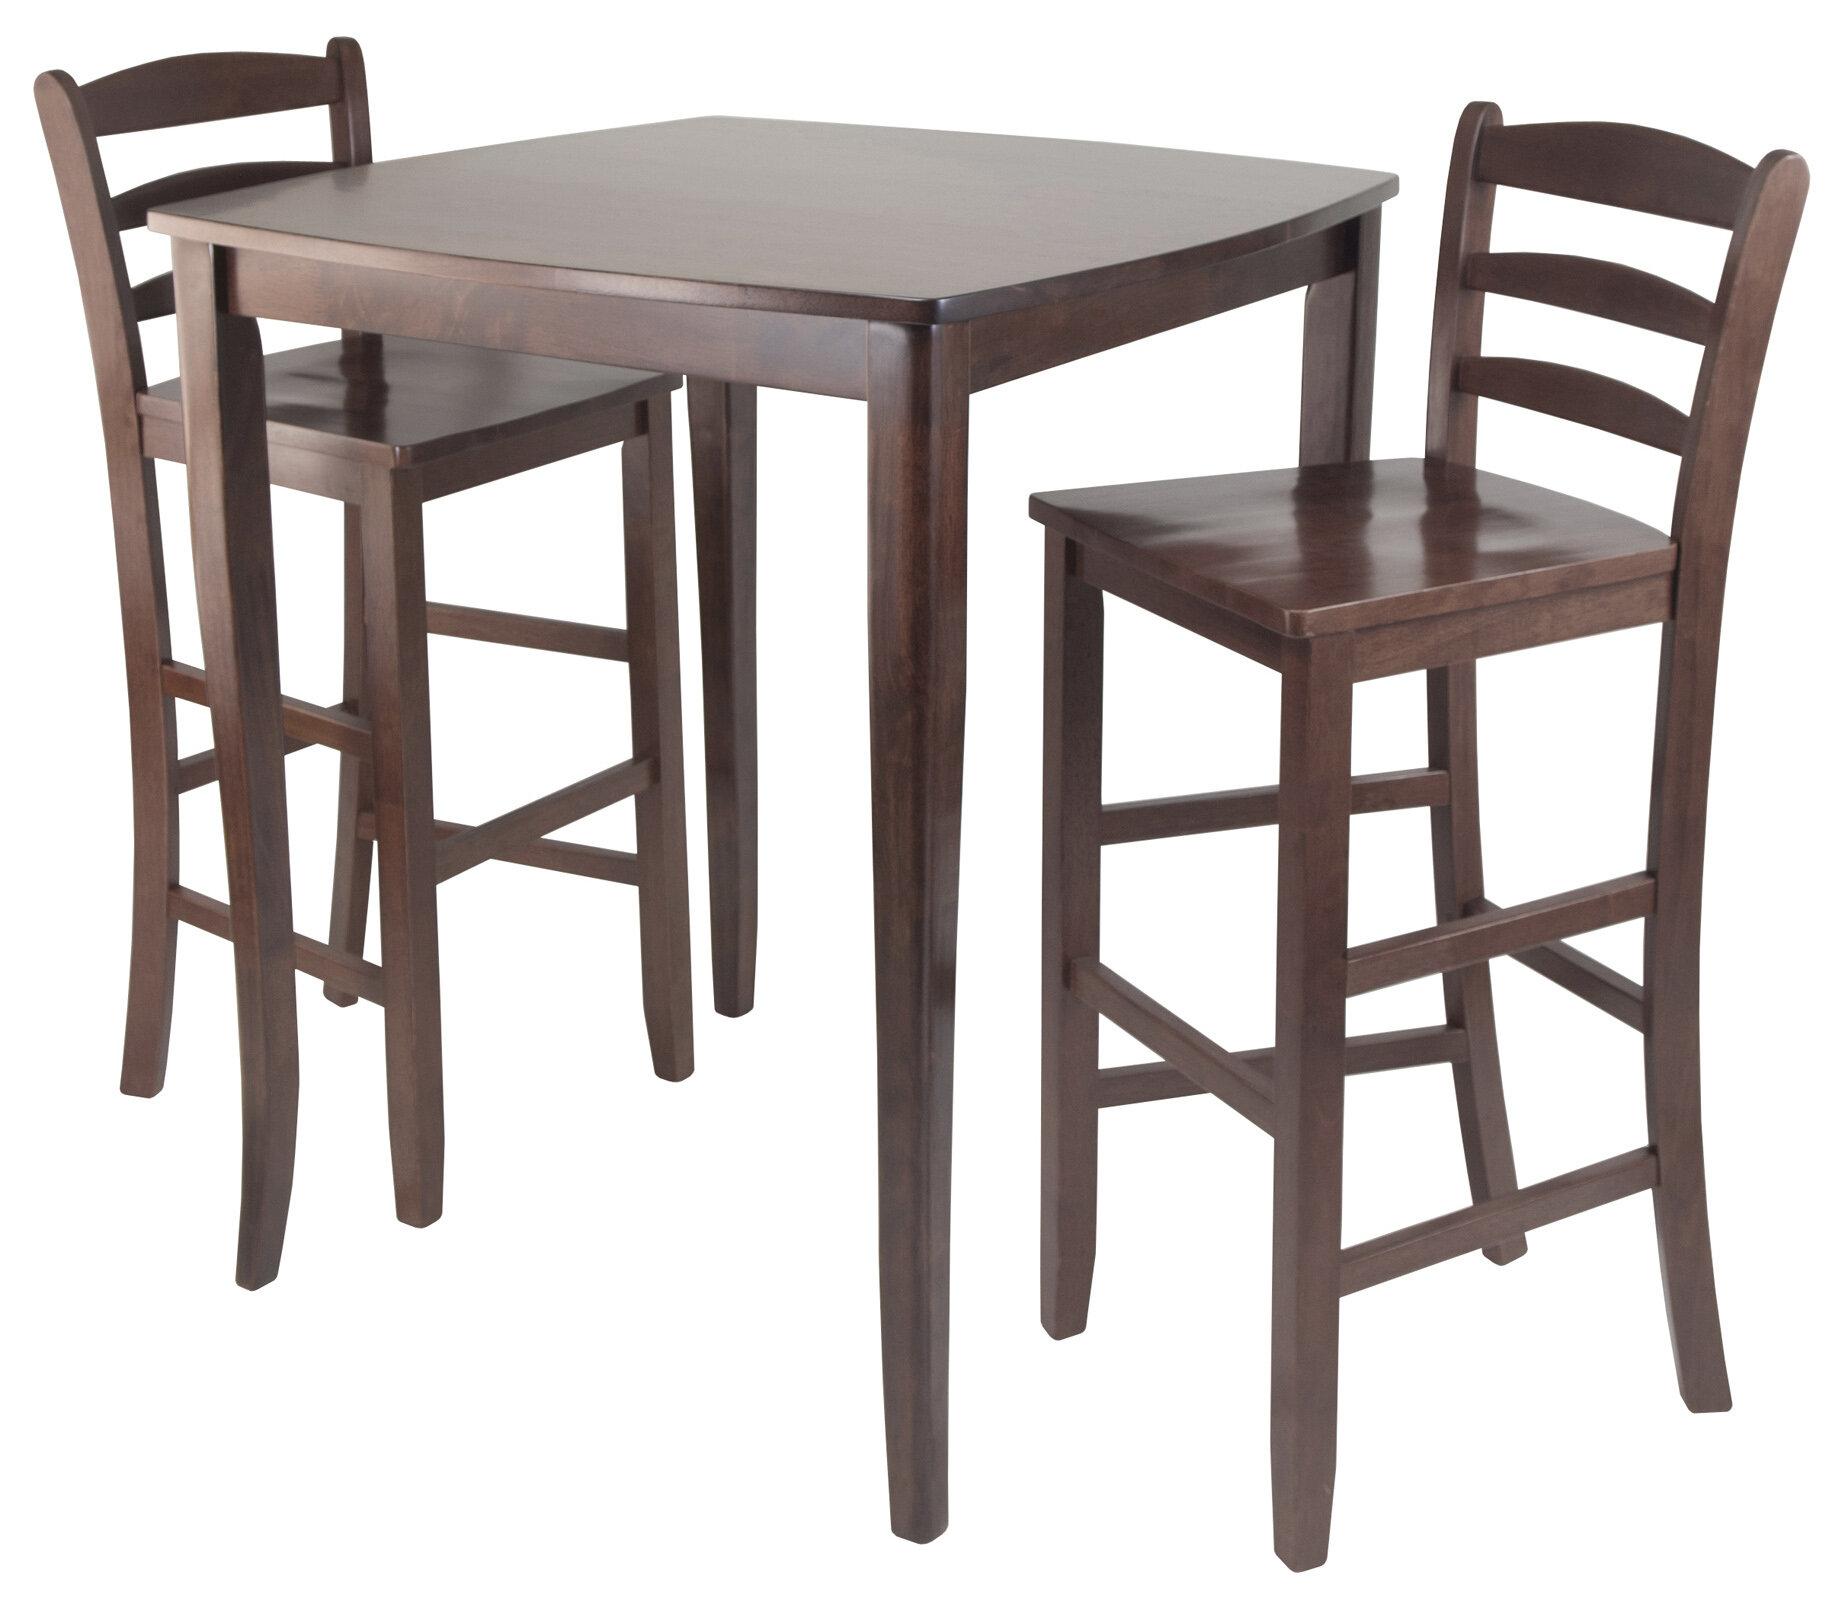 Red Barrel Studio Merkley 3 Piece Counter Height Pub Table Set Reviews Wayfair